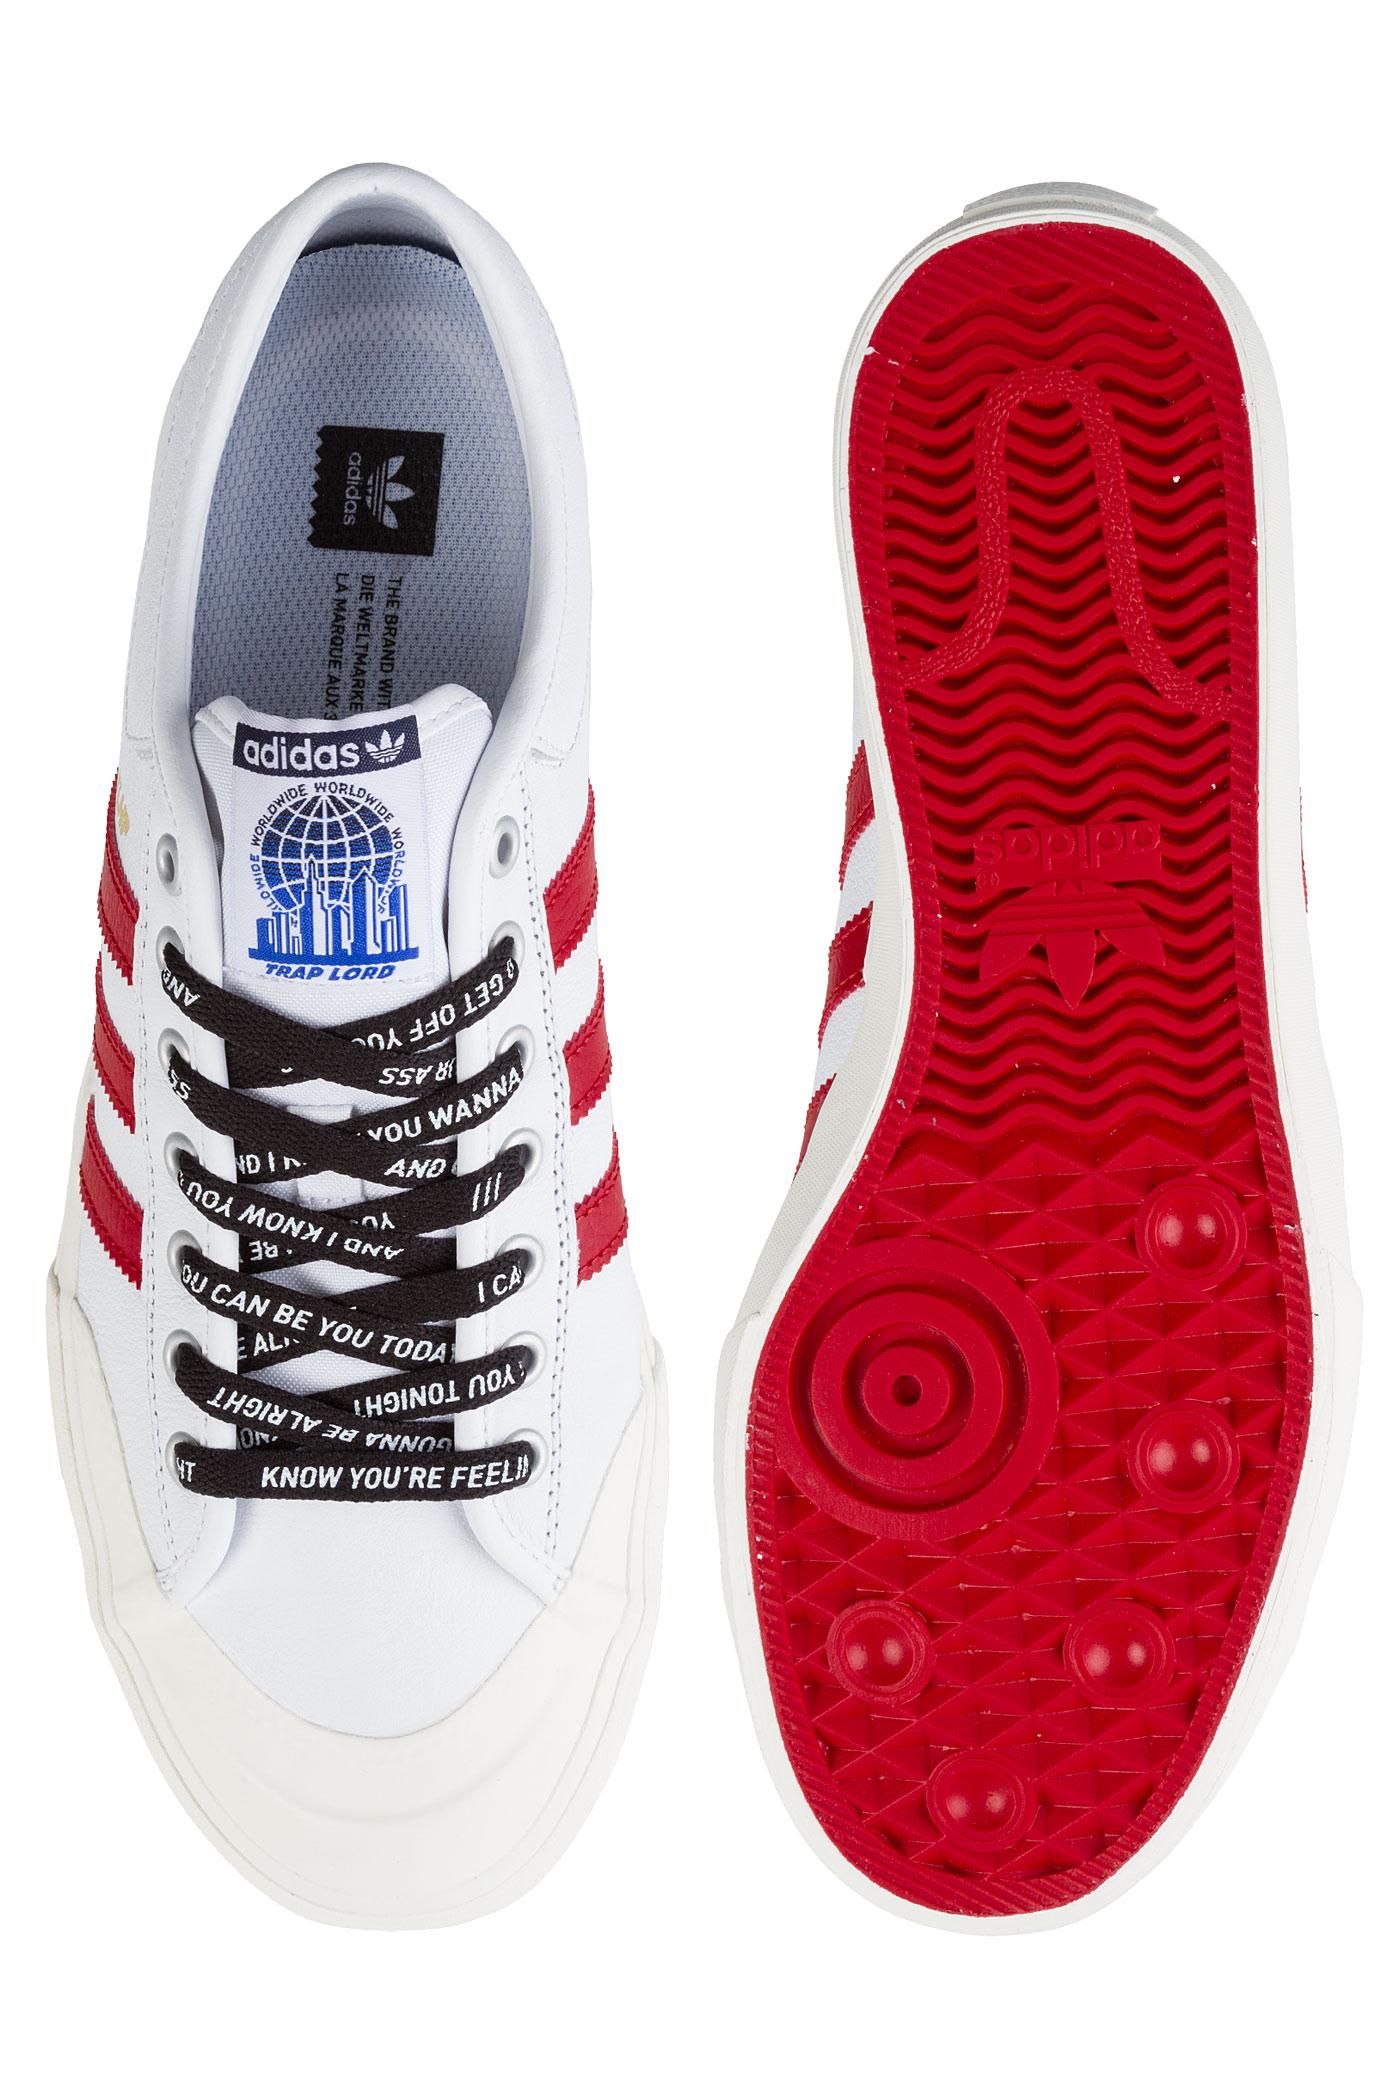 reputable site b0e83 e4be9 ... adidas Skateboarding x AAP Ferg Matchcourt Chaussure (white scarlet)  ...